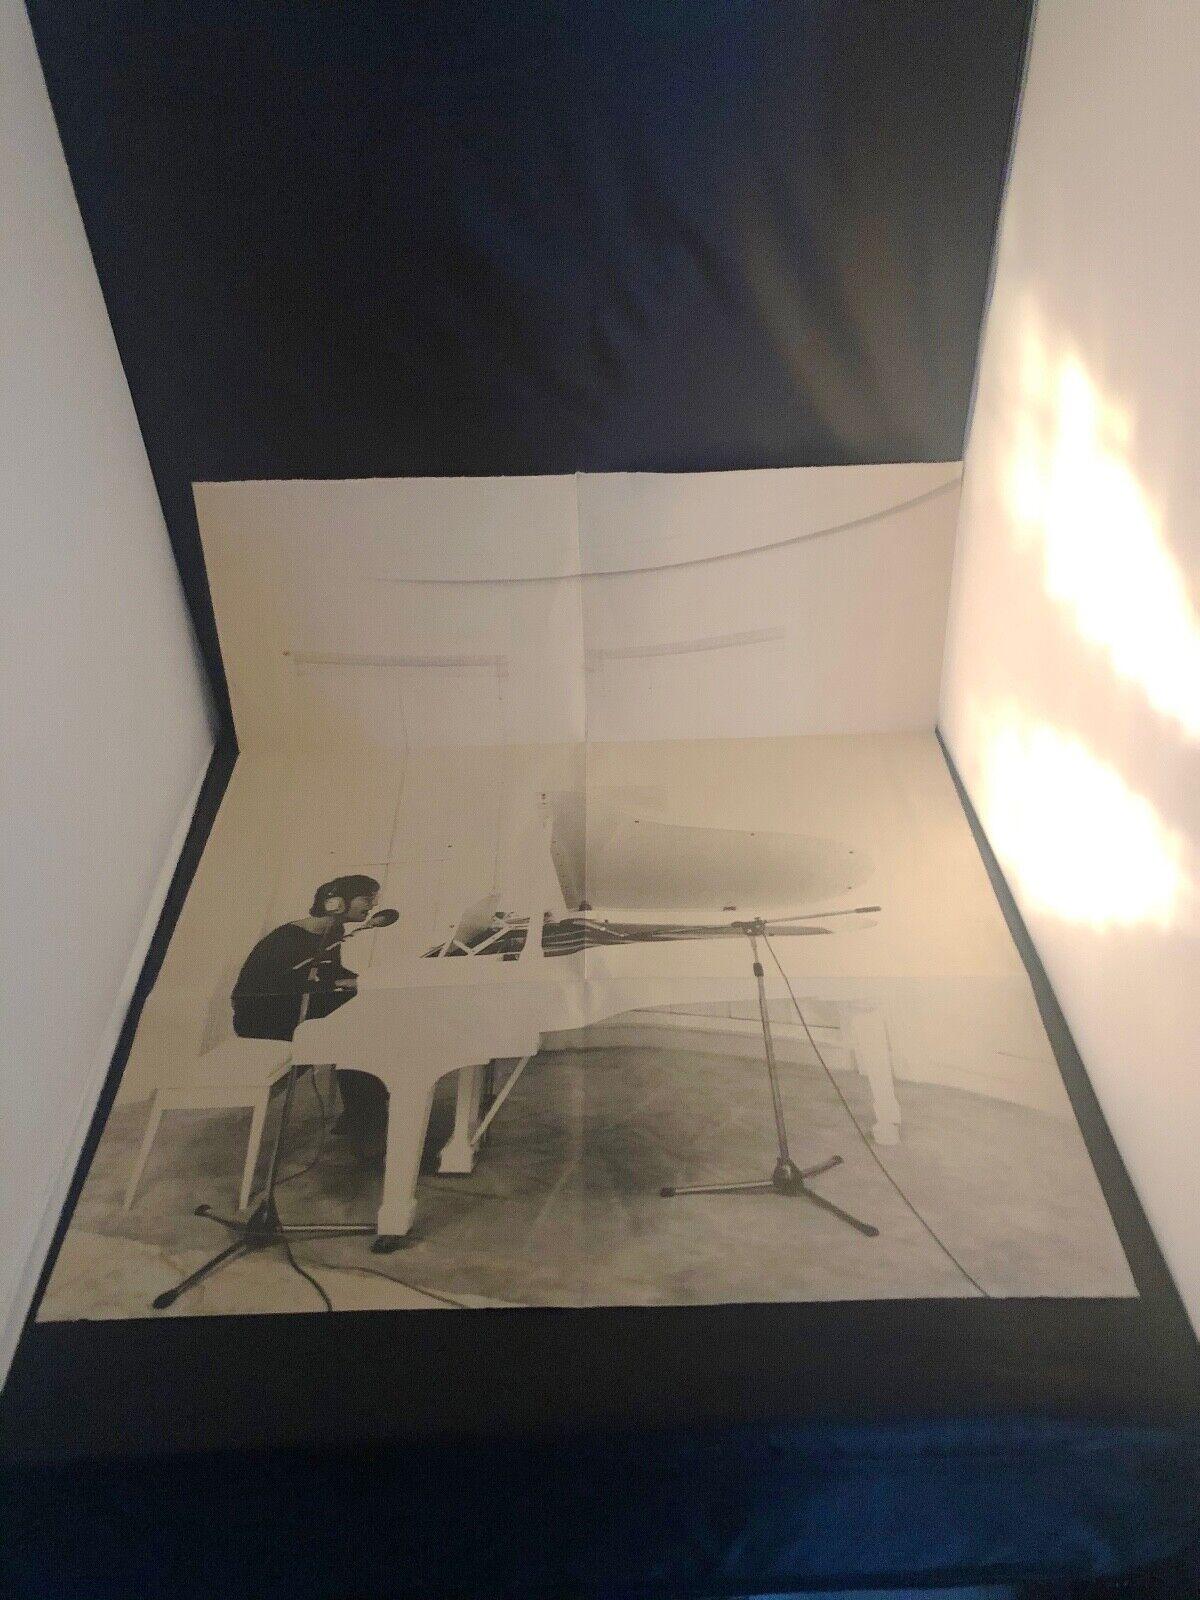 JOHN LENNON AT PIANO - PHOTO BY Peter Fordham Black White Poster 32 x 22  - $4.00